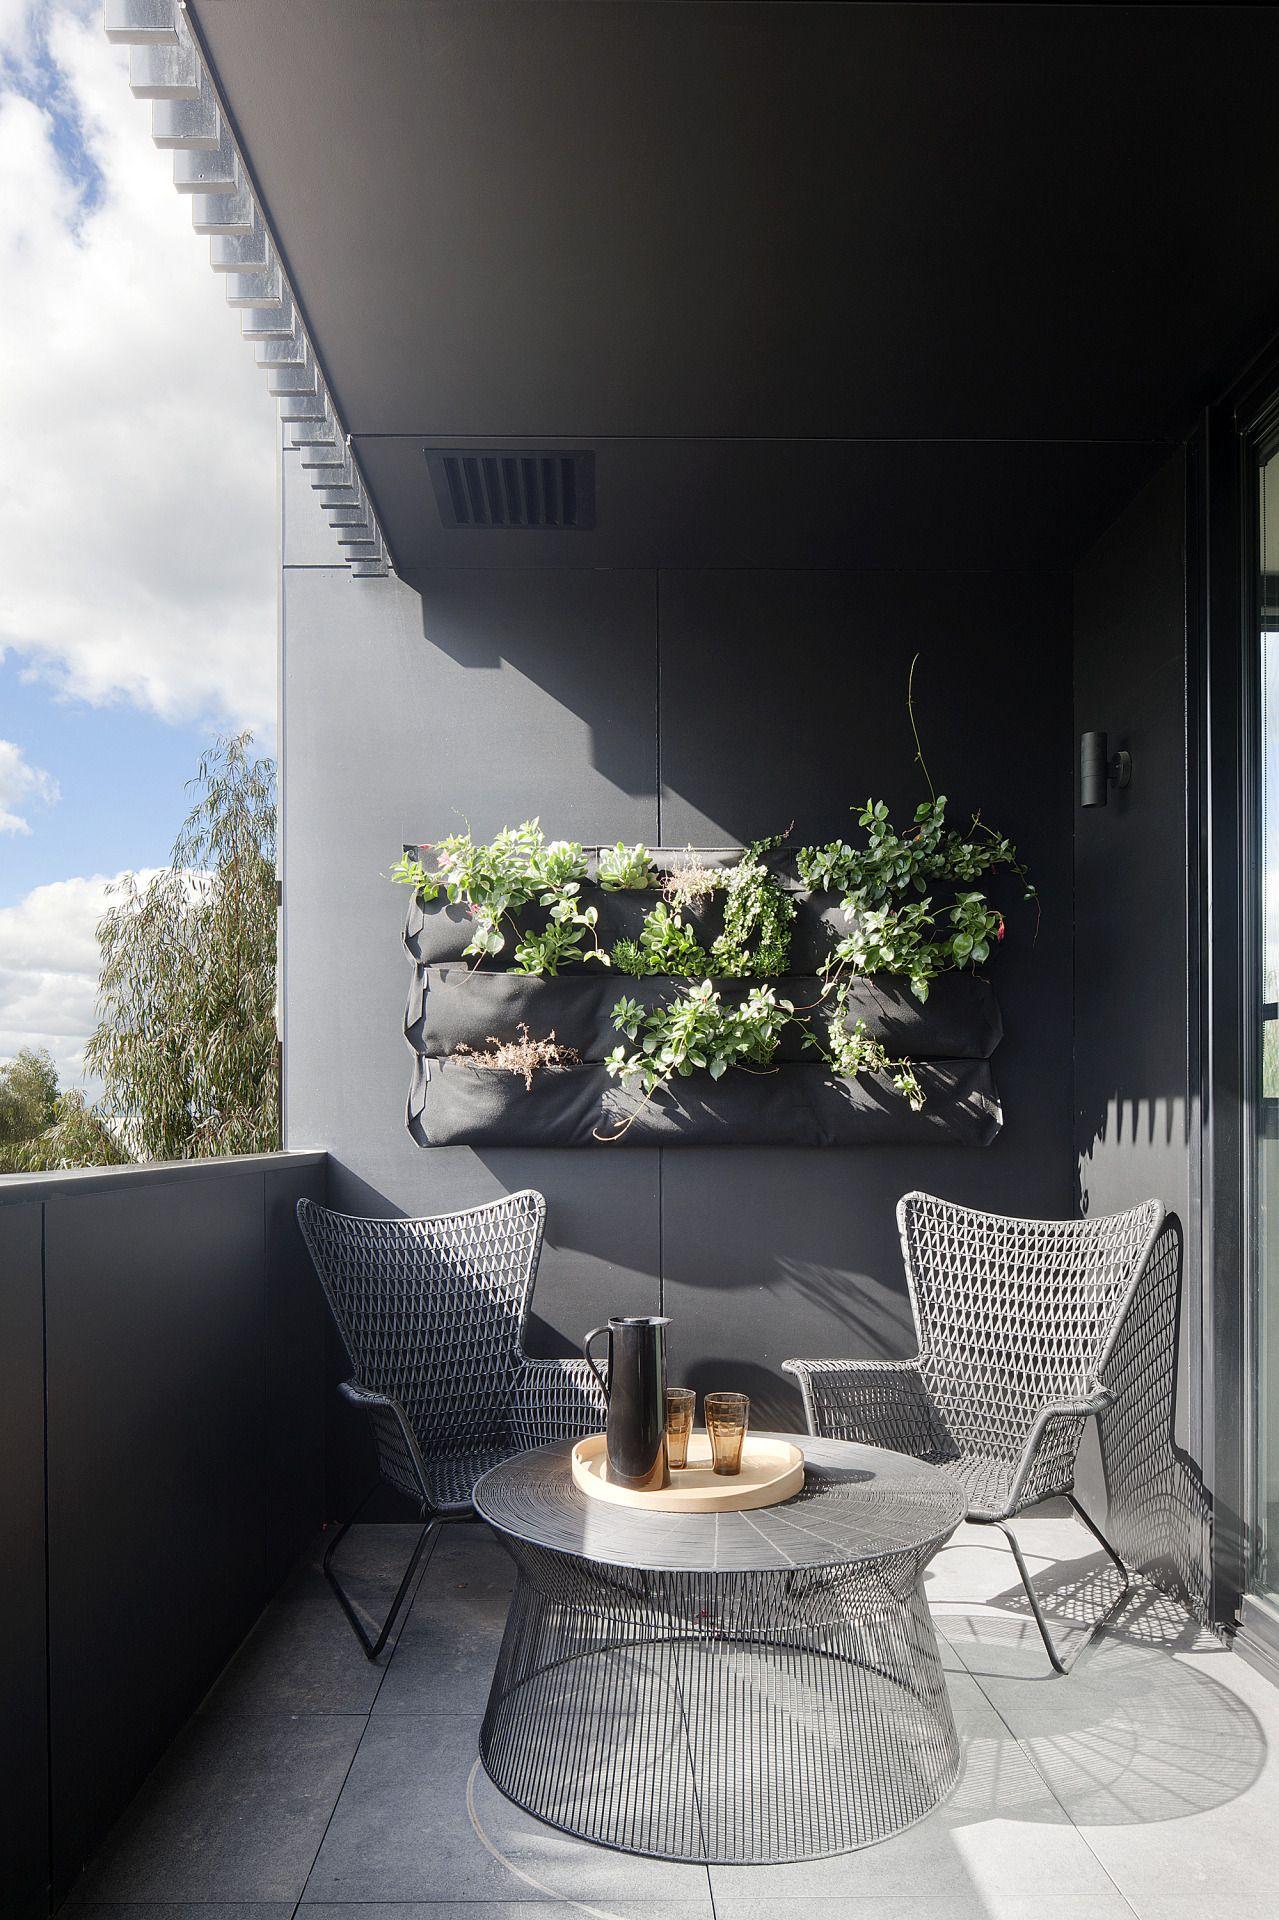 Balcon Design 10 small balcony garden ideas: how to dress up your balcony